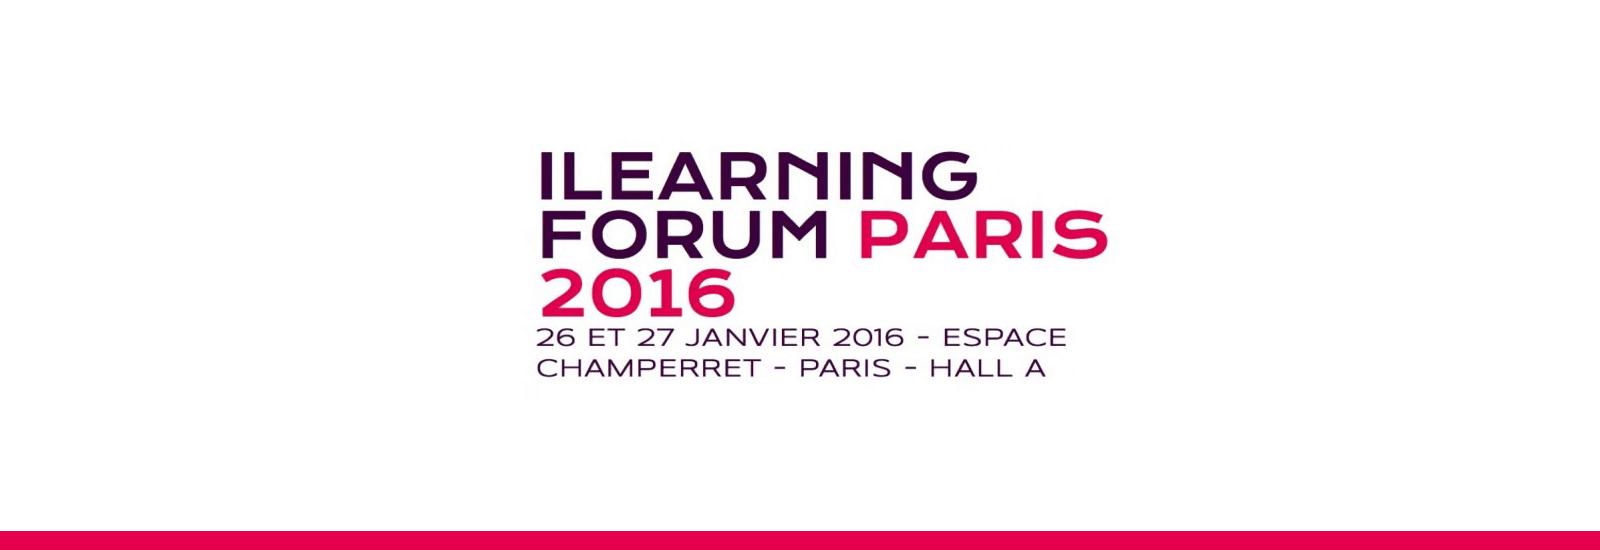 Salon ILearning forum Paris 2016